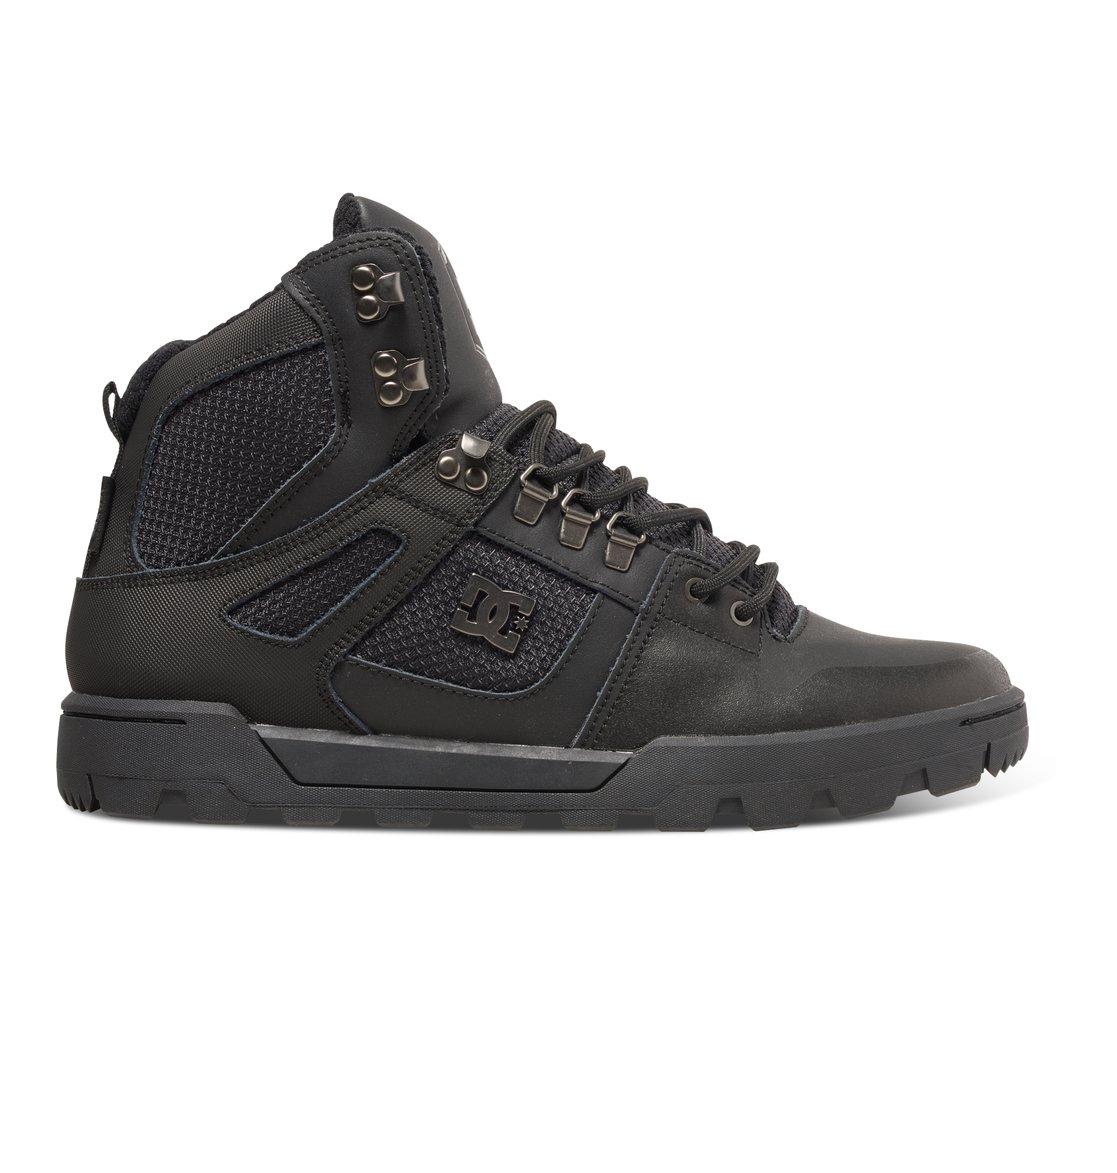 DC Shoes™ Spartan High WR Boots ADYB100001